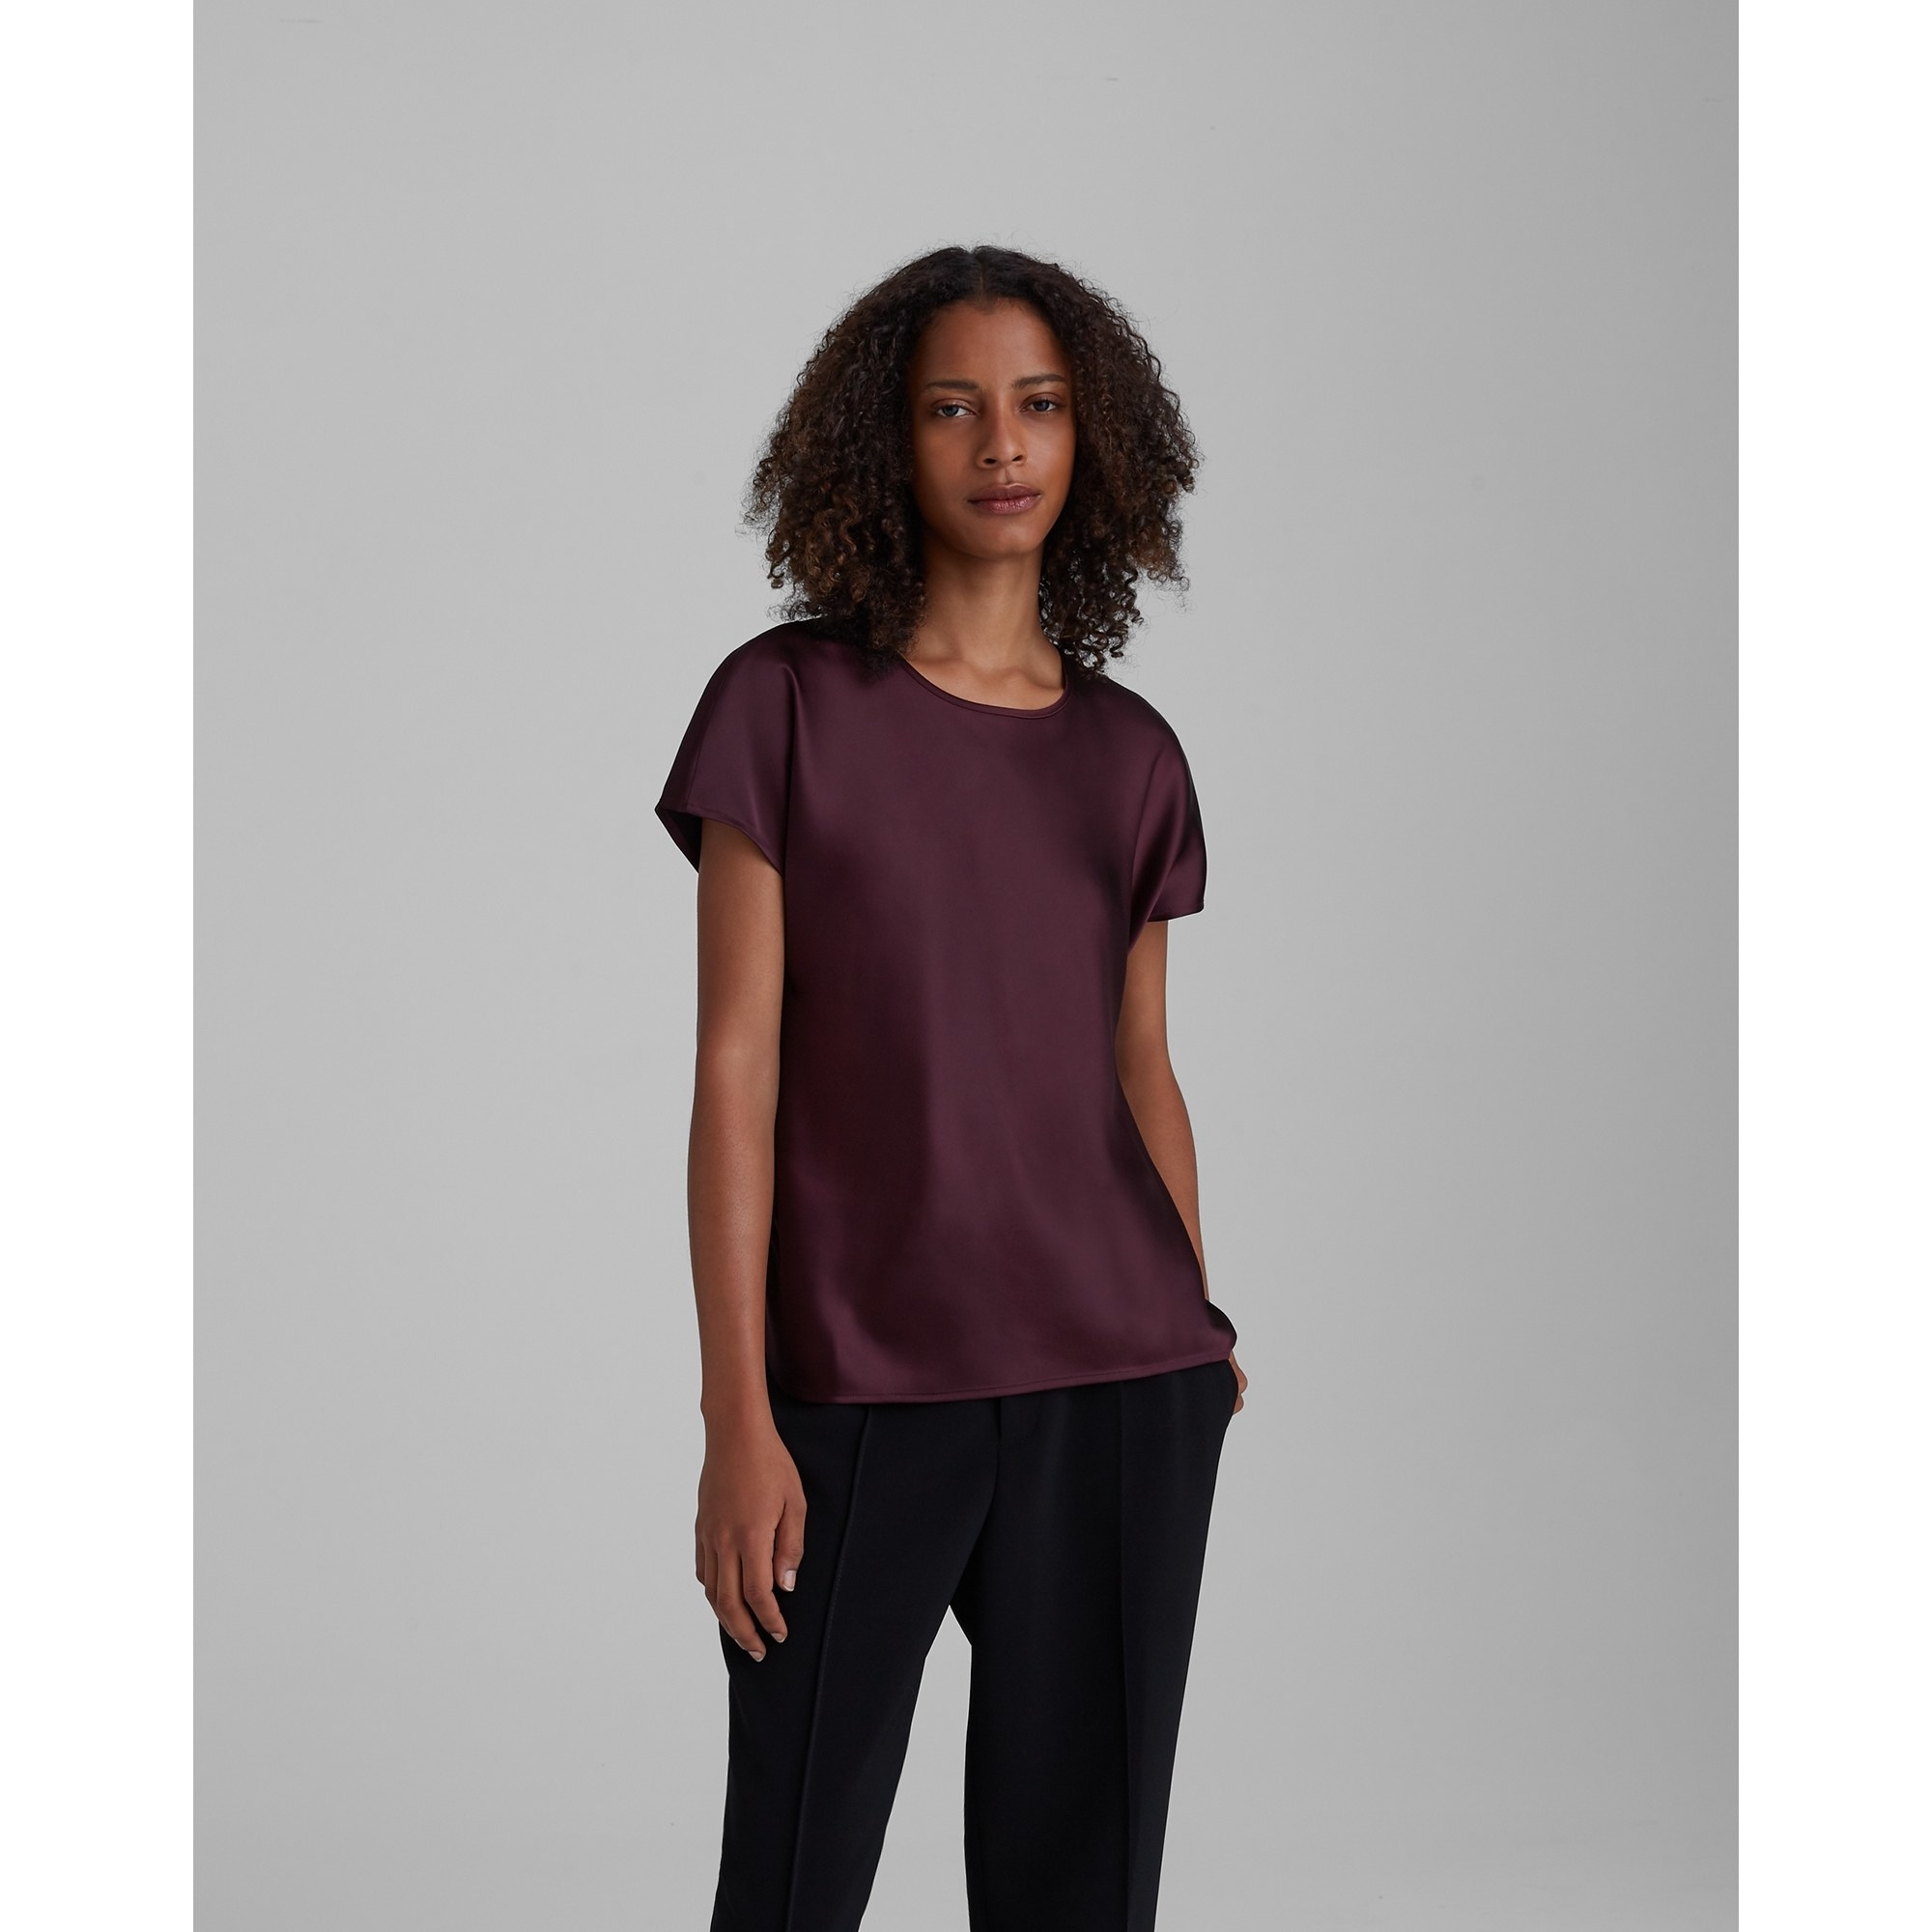 model posing in a silk t-shirt